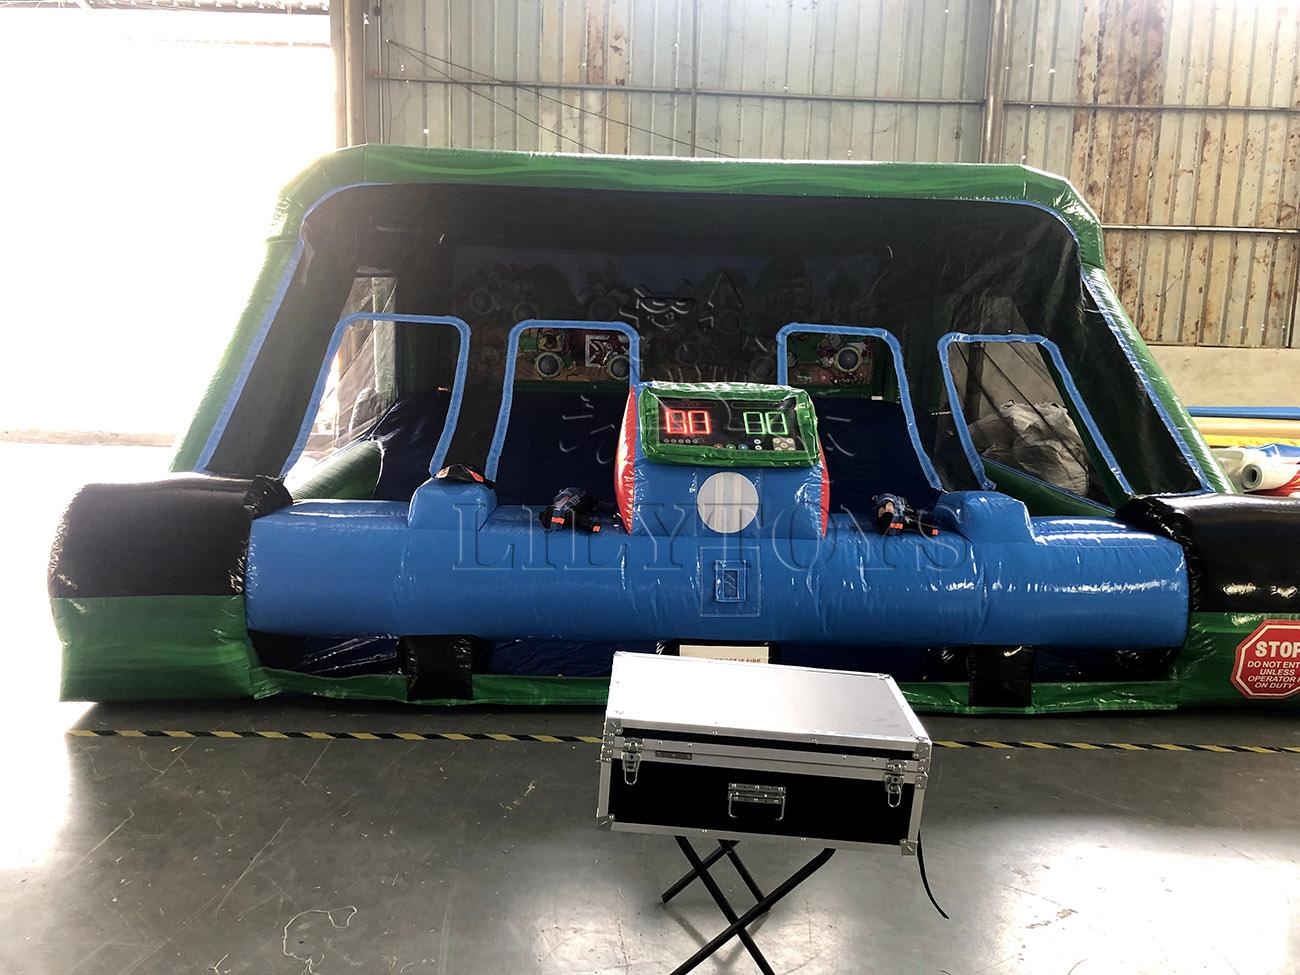 inflatable interactive games IPS